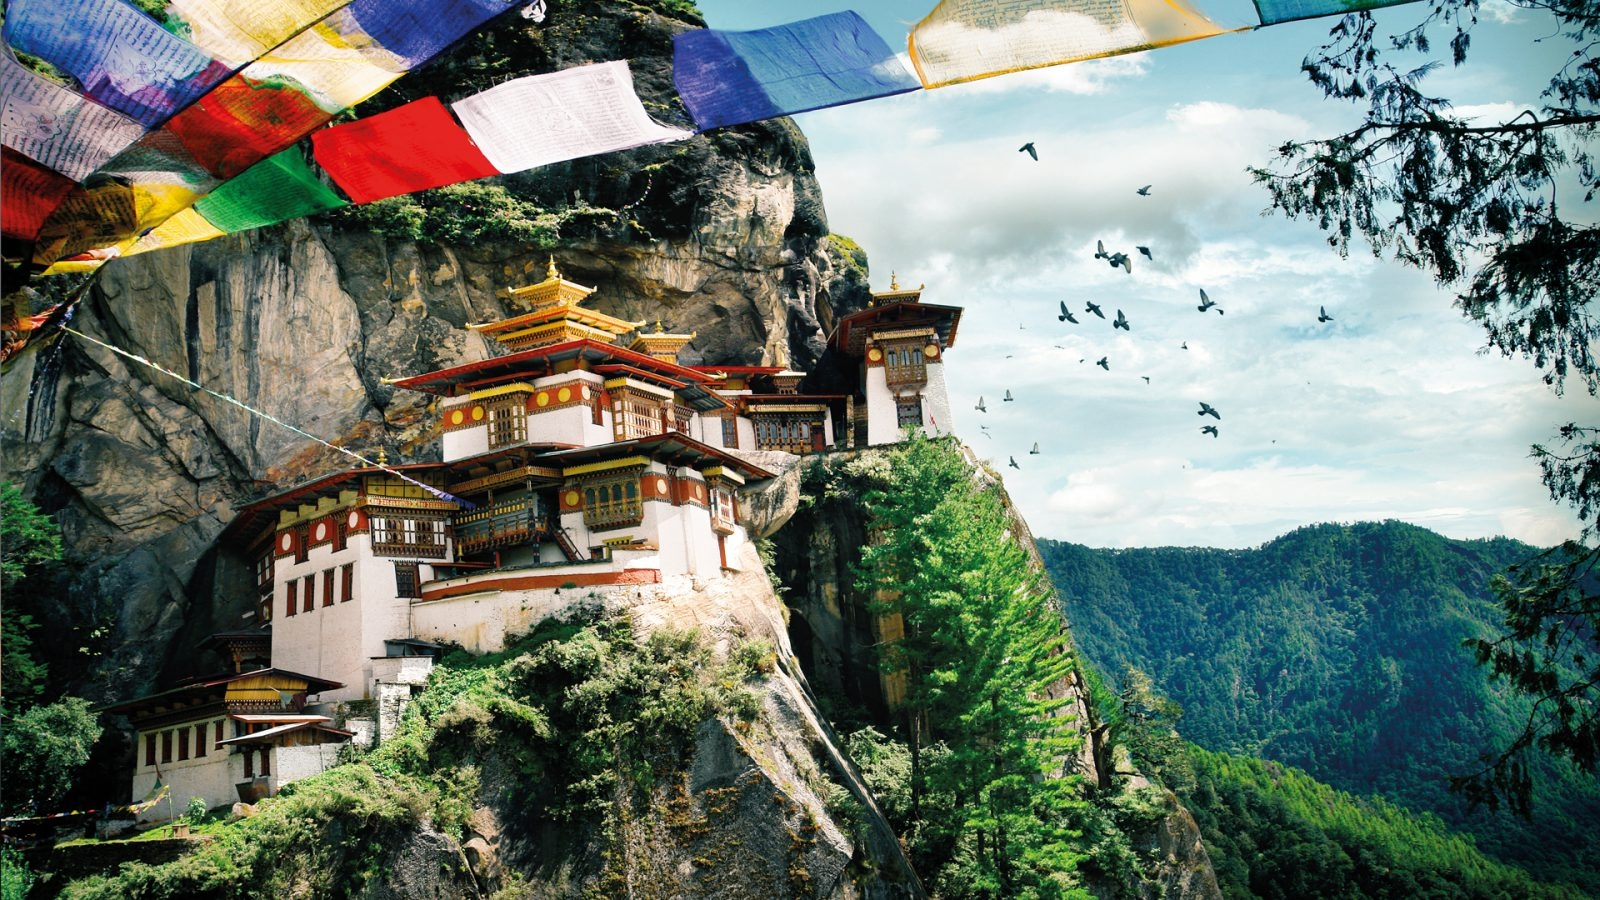 Tiger Nest Monastery Tour In Bhutan By Himalayan Adventure Treks